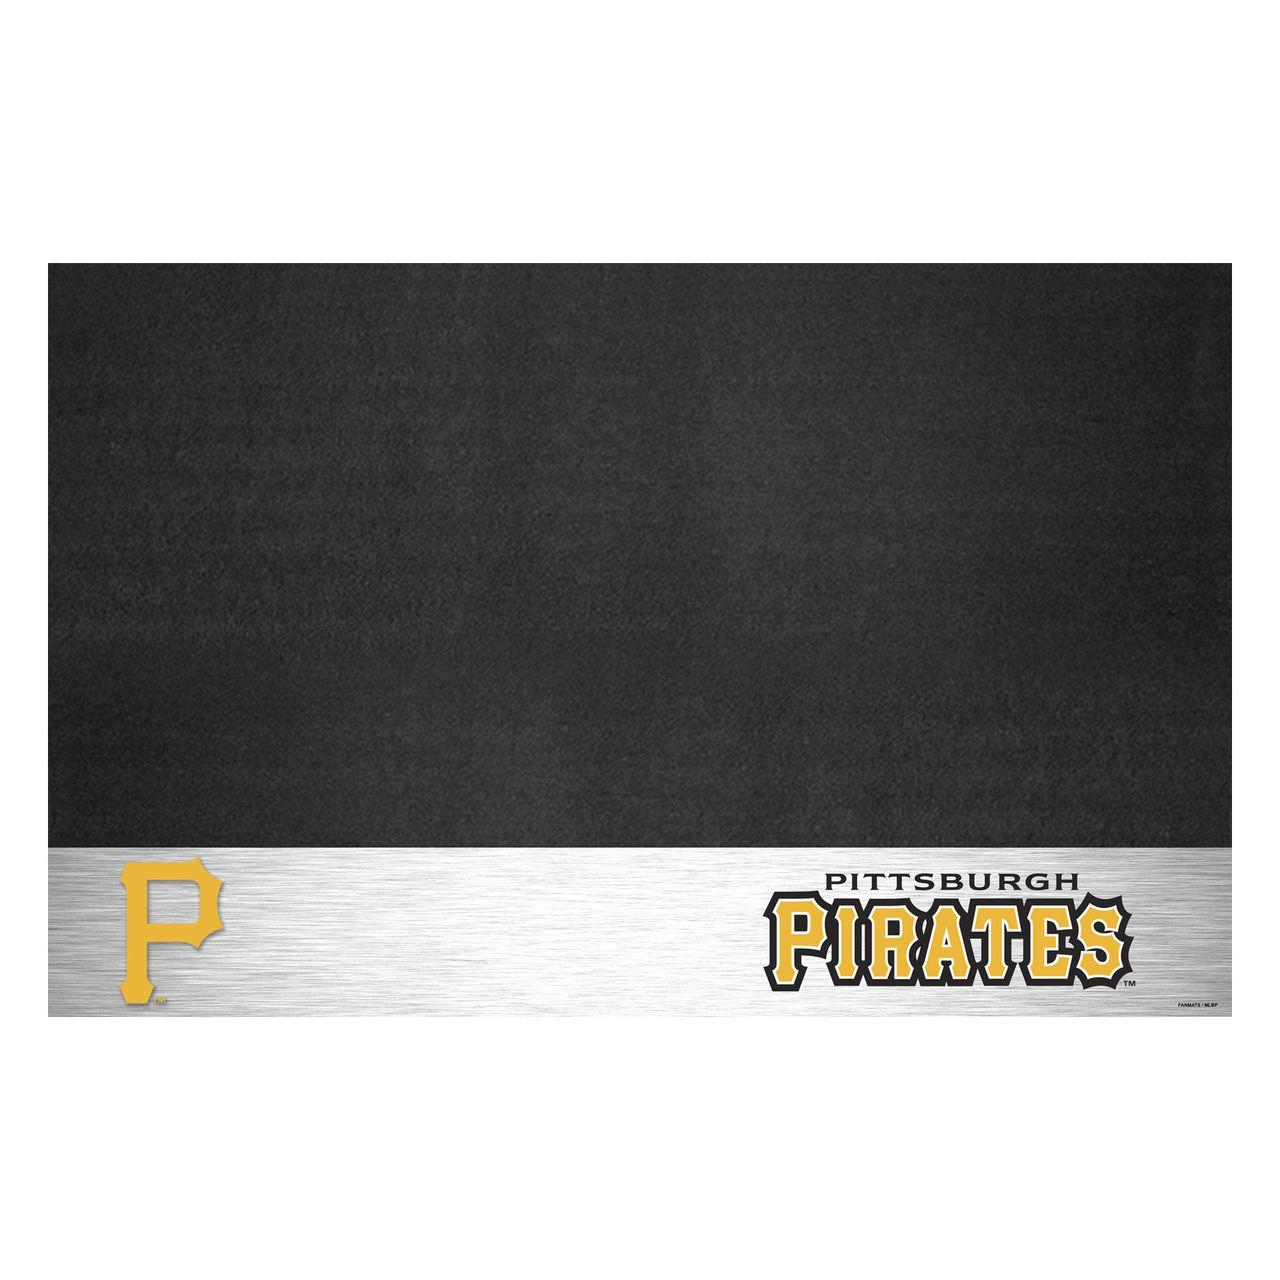 "Fanmats 12165 MLB - Pittsburgh Pirates Grill Mat 26""x42"""